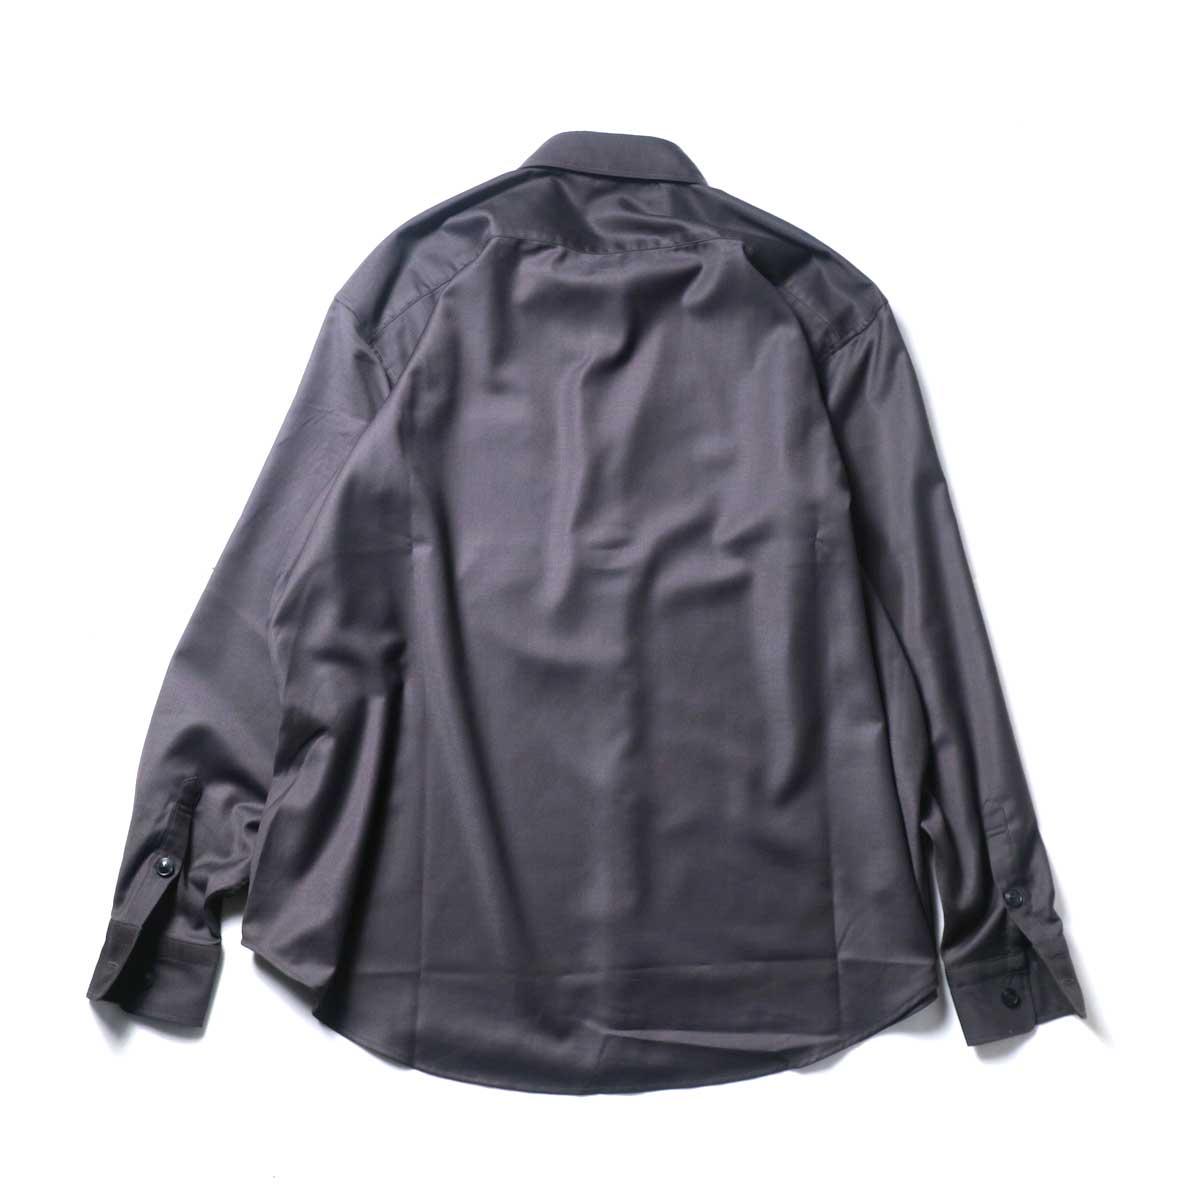 alvana / Wrinkle Proof Wide Shirts (Charcoal)背面